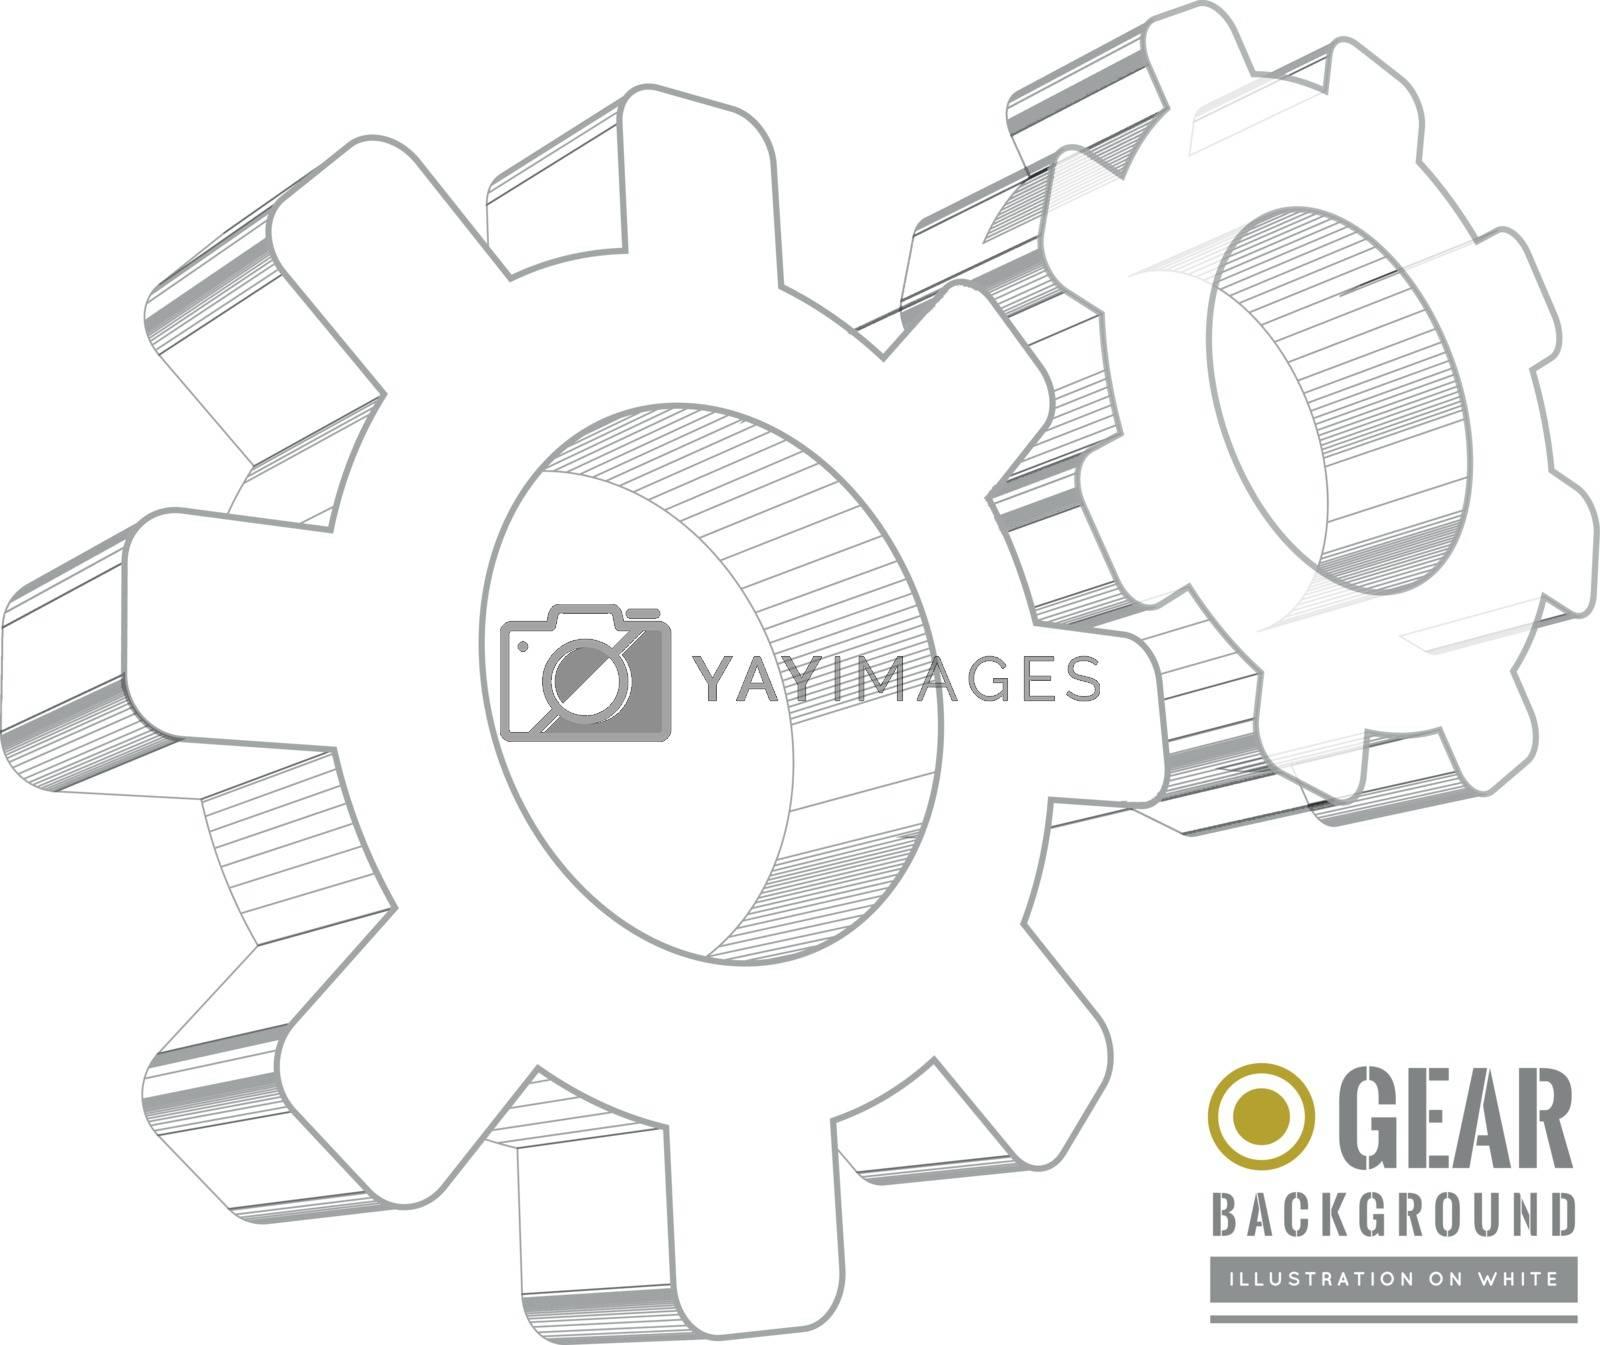 Gear schematic vector illustration on white background